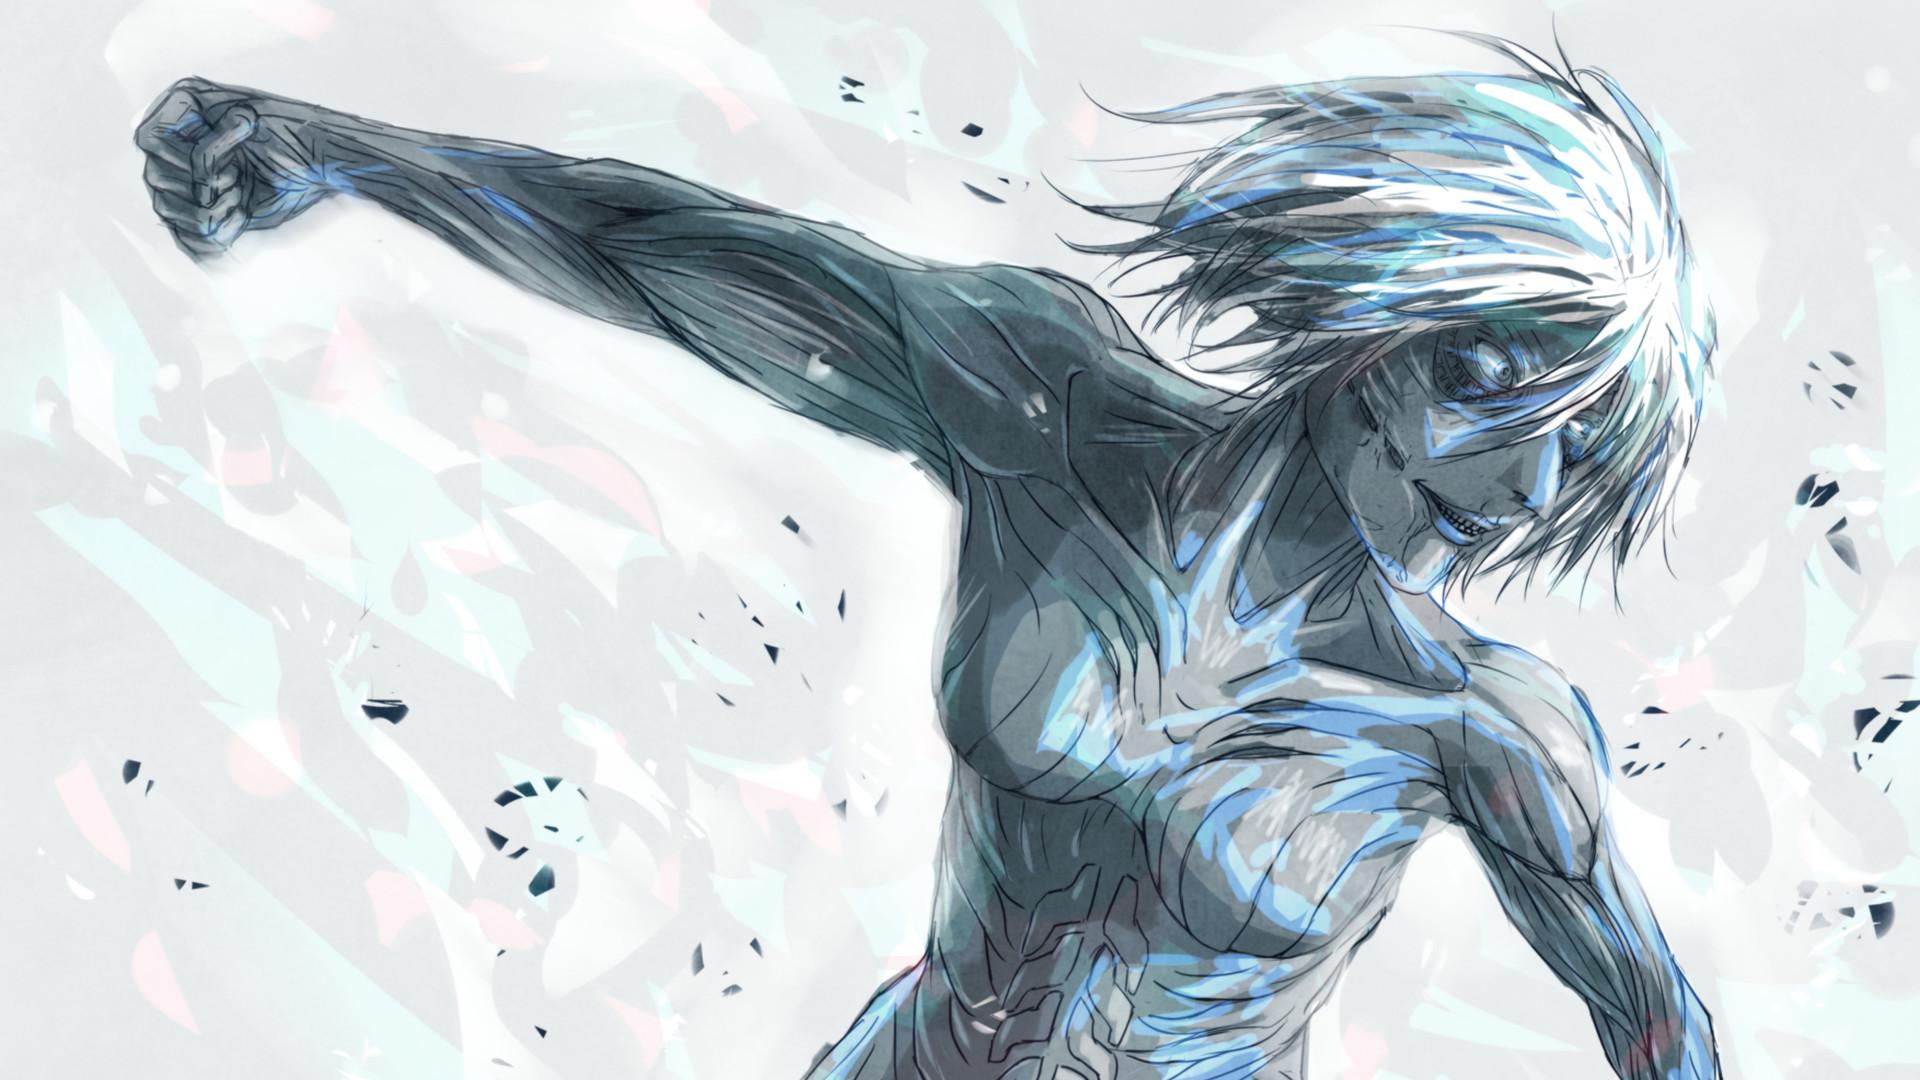 Anime Attack On Titan Annie Leonhart Wallpaper